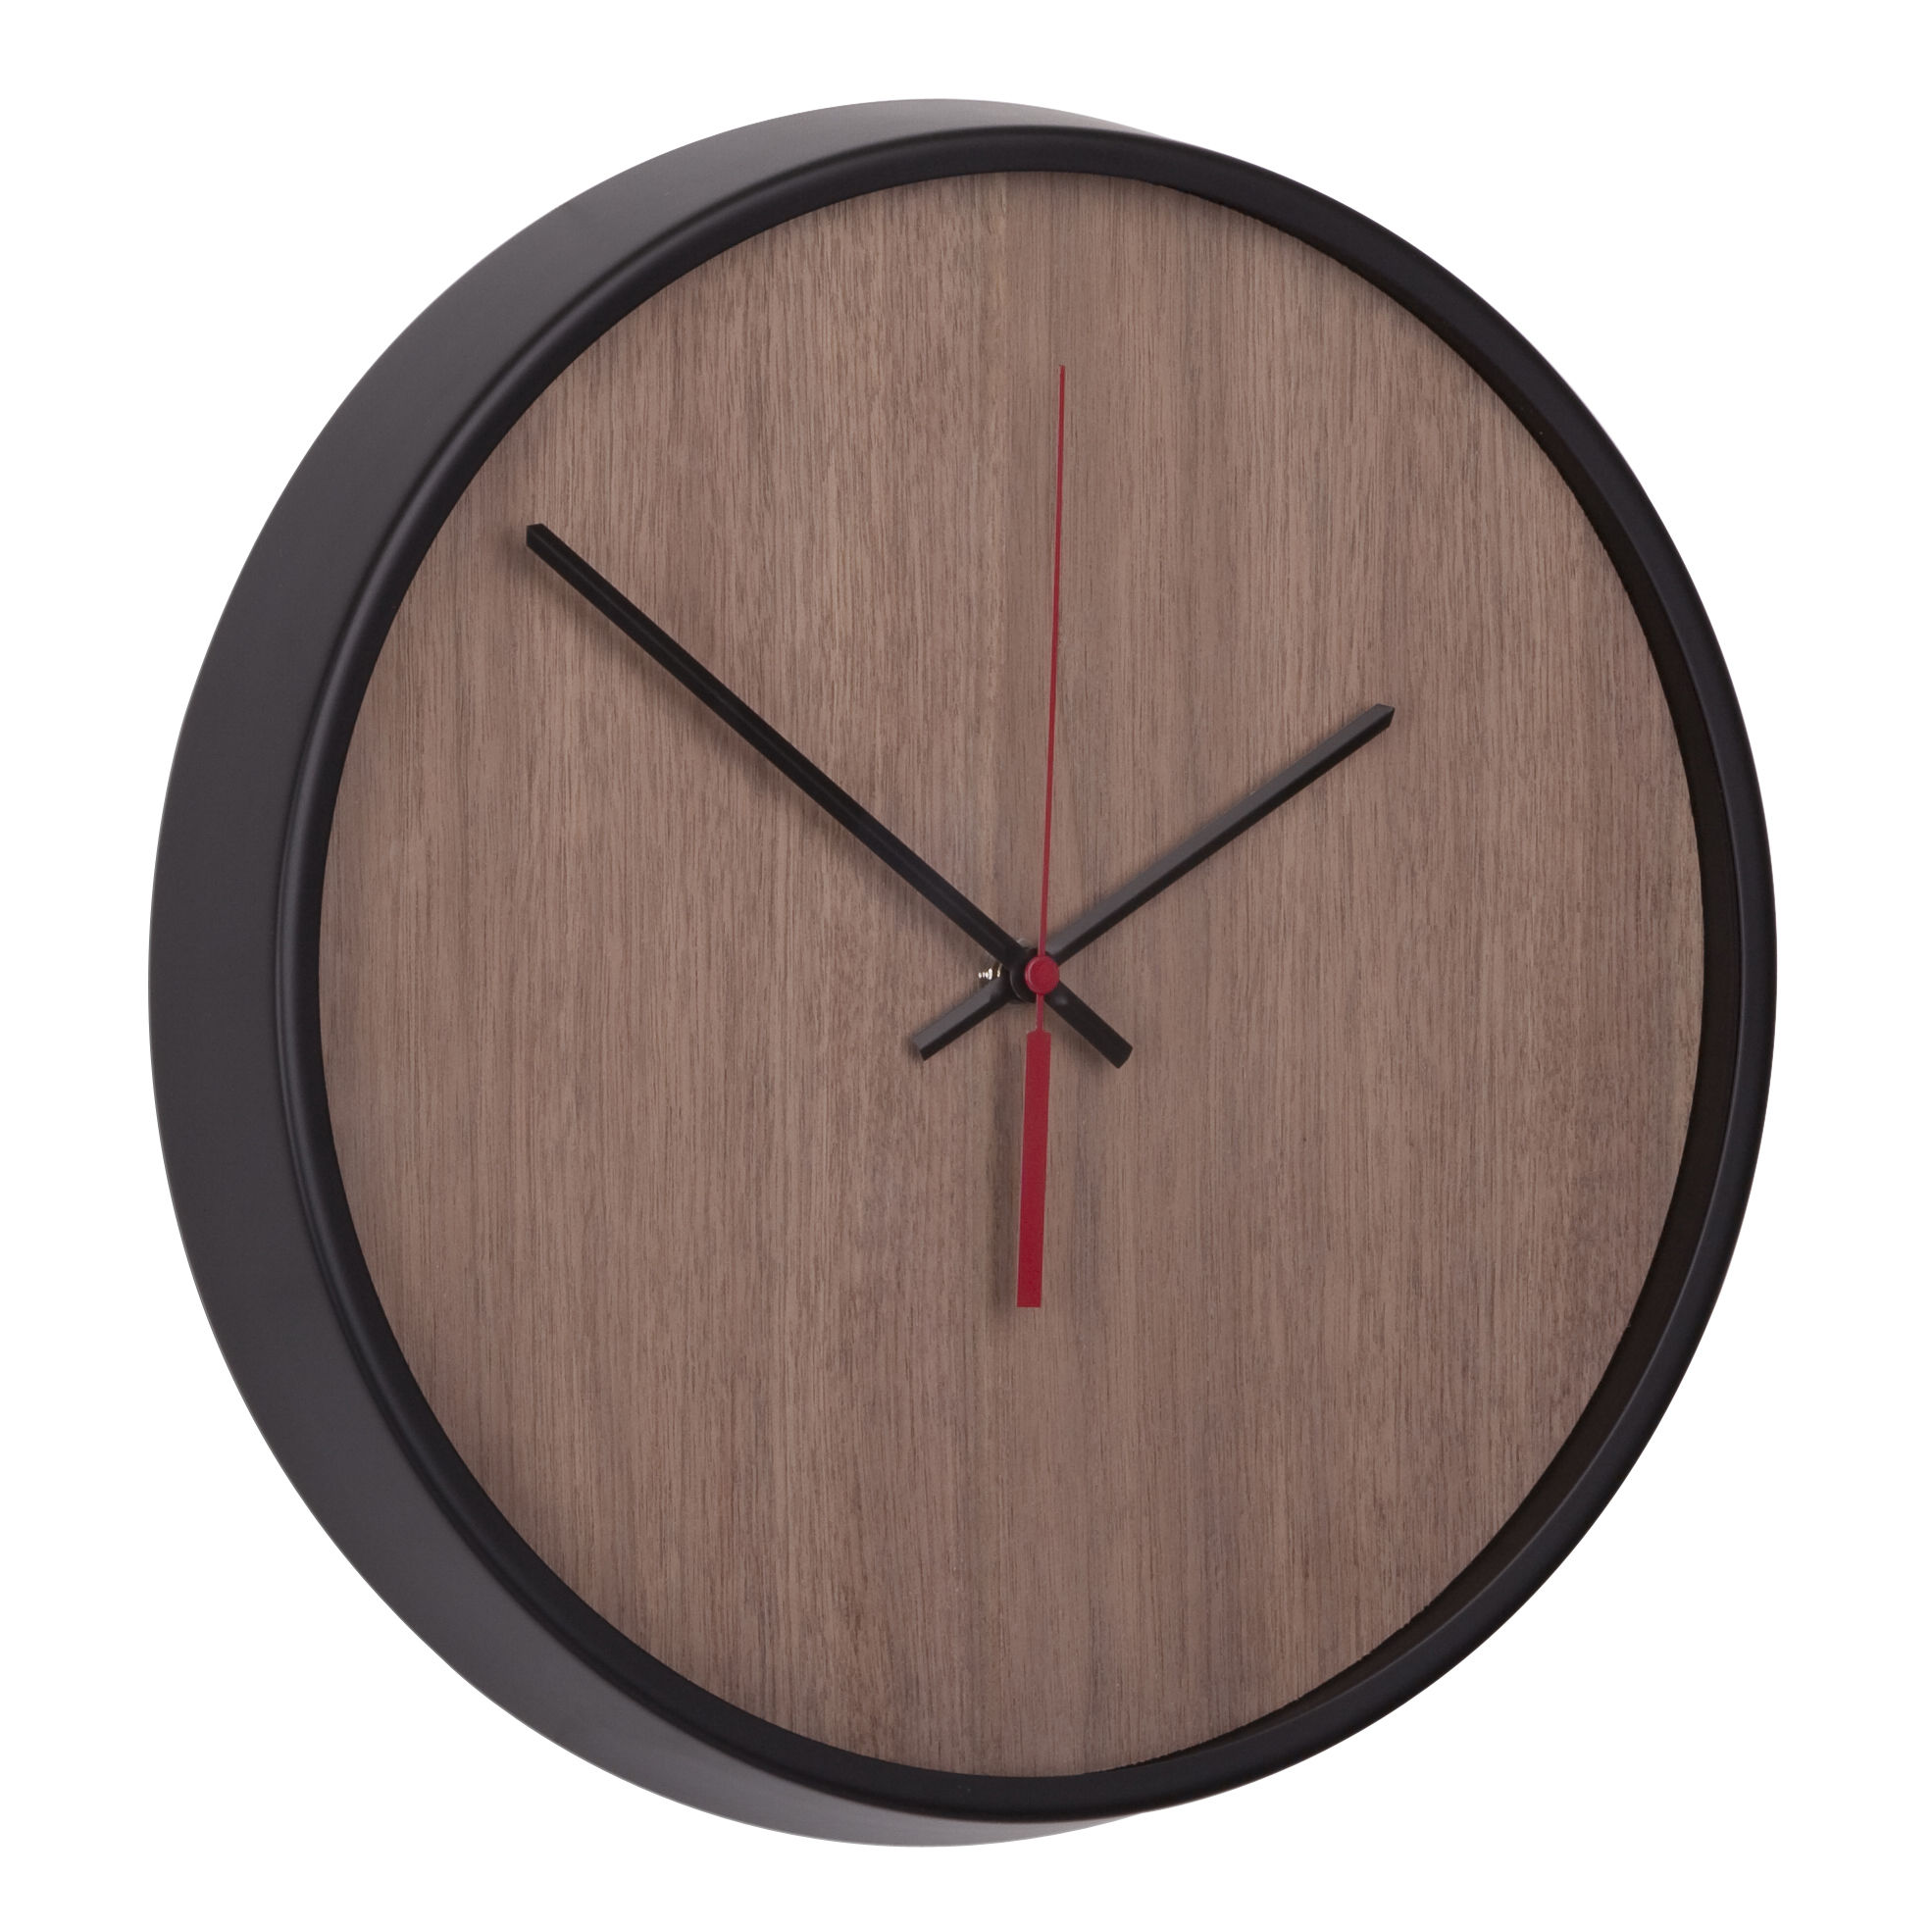 Déco - Horloges  - Horloge murale Madera / Ø 32 cm - Umbra - Noir / Noyer naturel - Aluminium, Hêtre, Verre